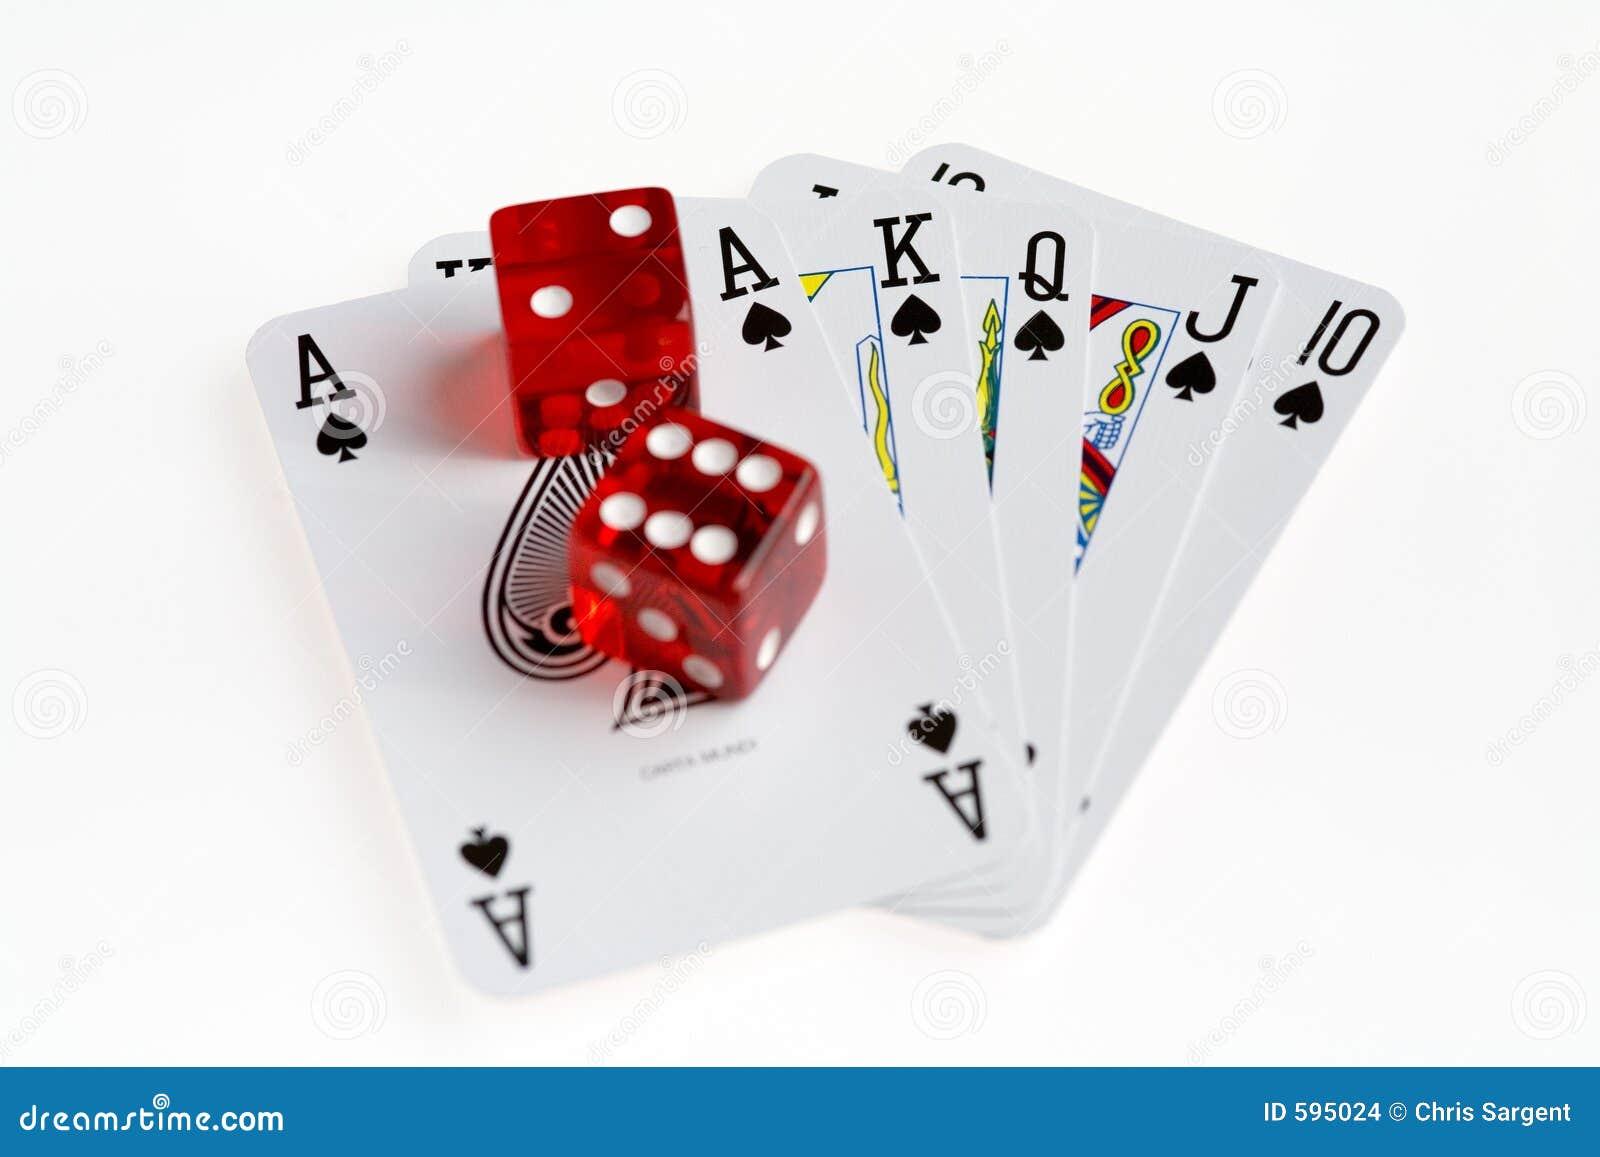 ace high flush poker rules images